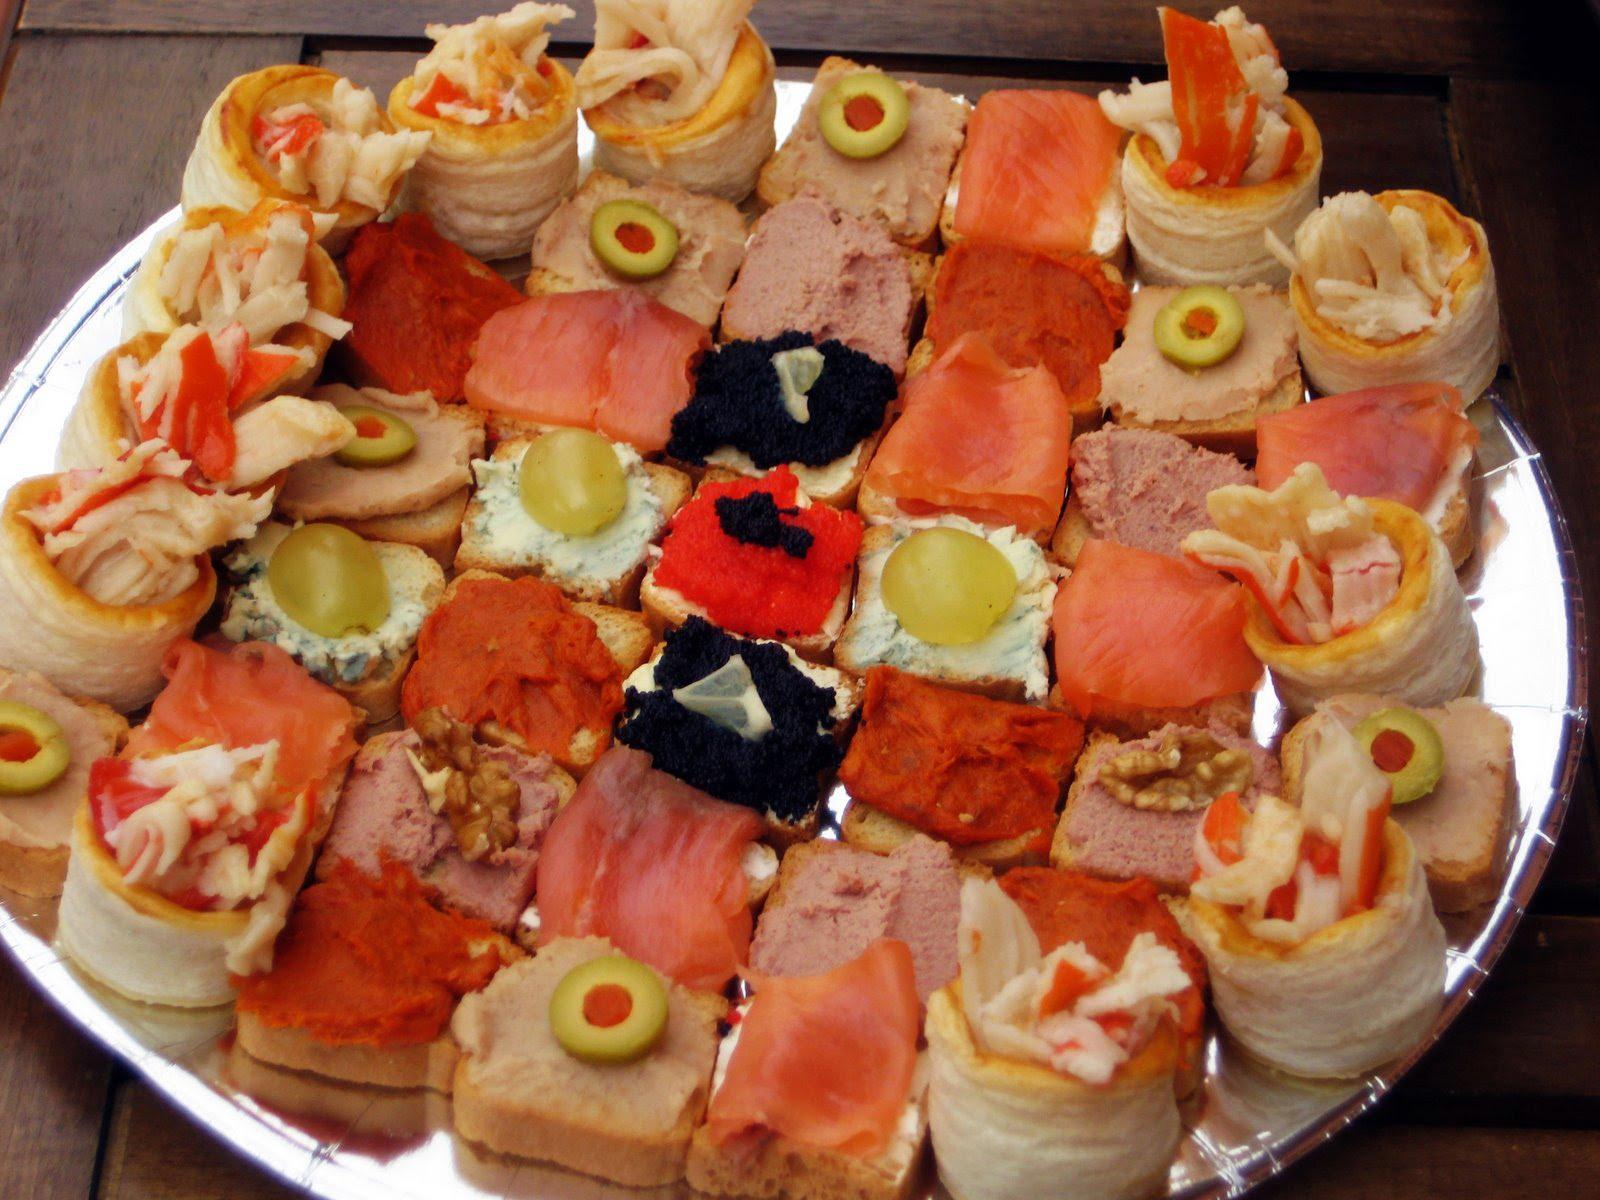 Menjar i gaudir canap s variats canapes variados for Recetas para canape